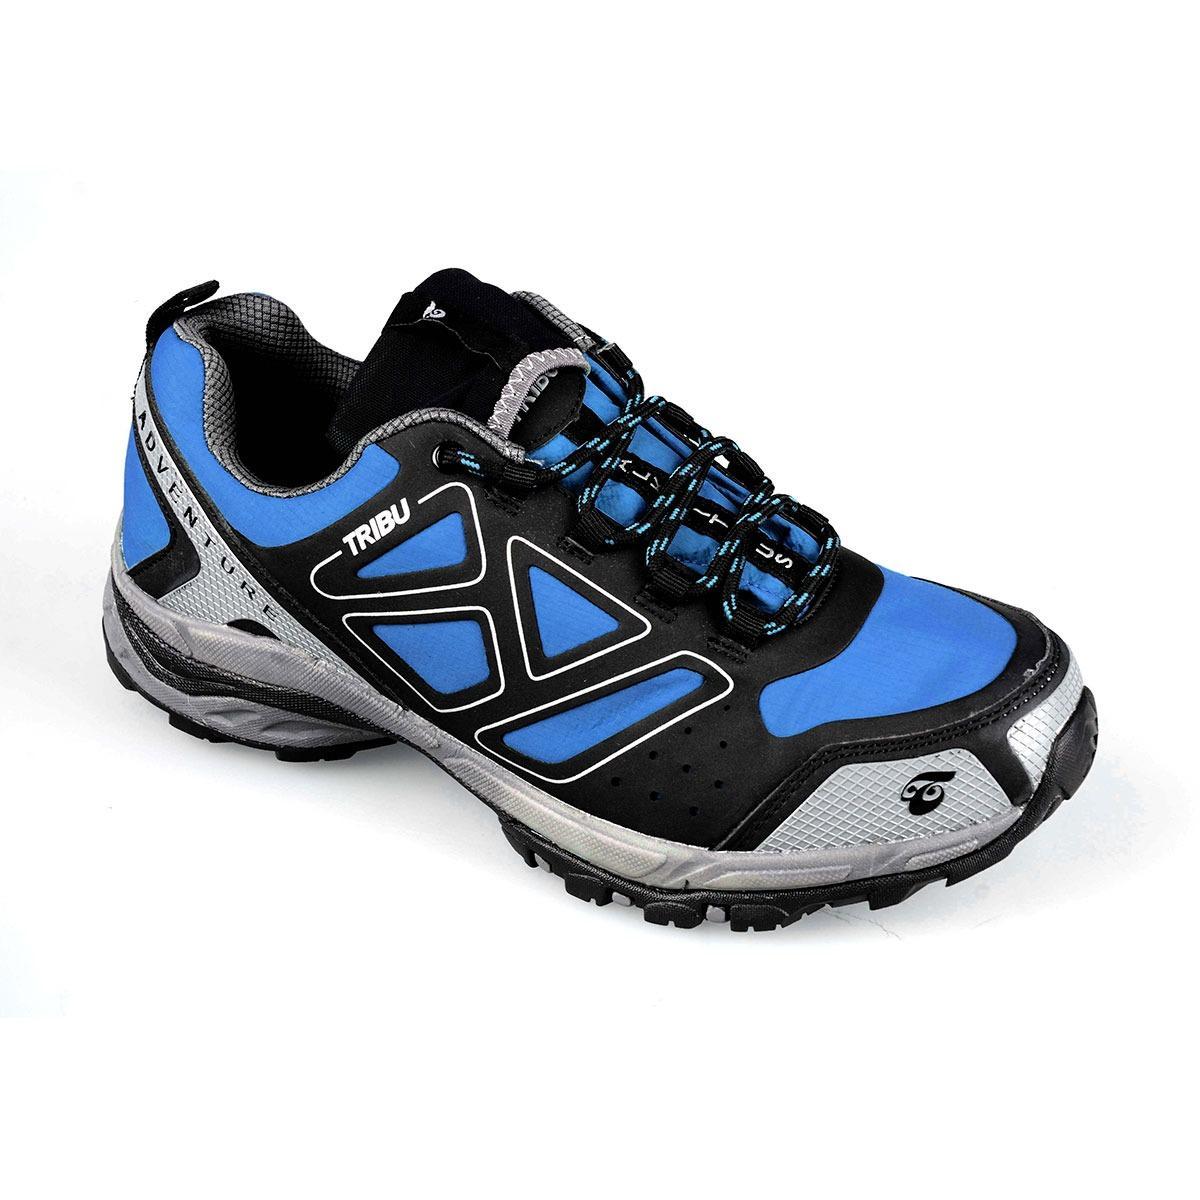 Tribu Armor Shoes (Blue)